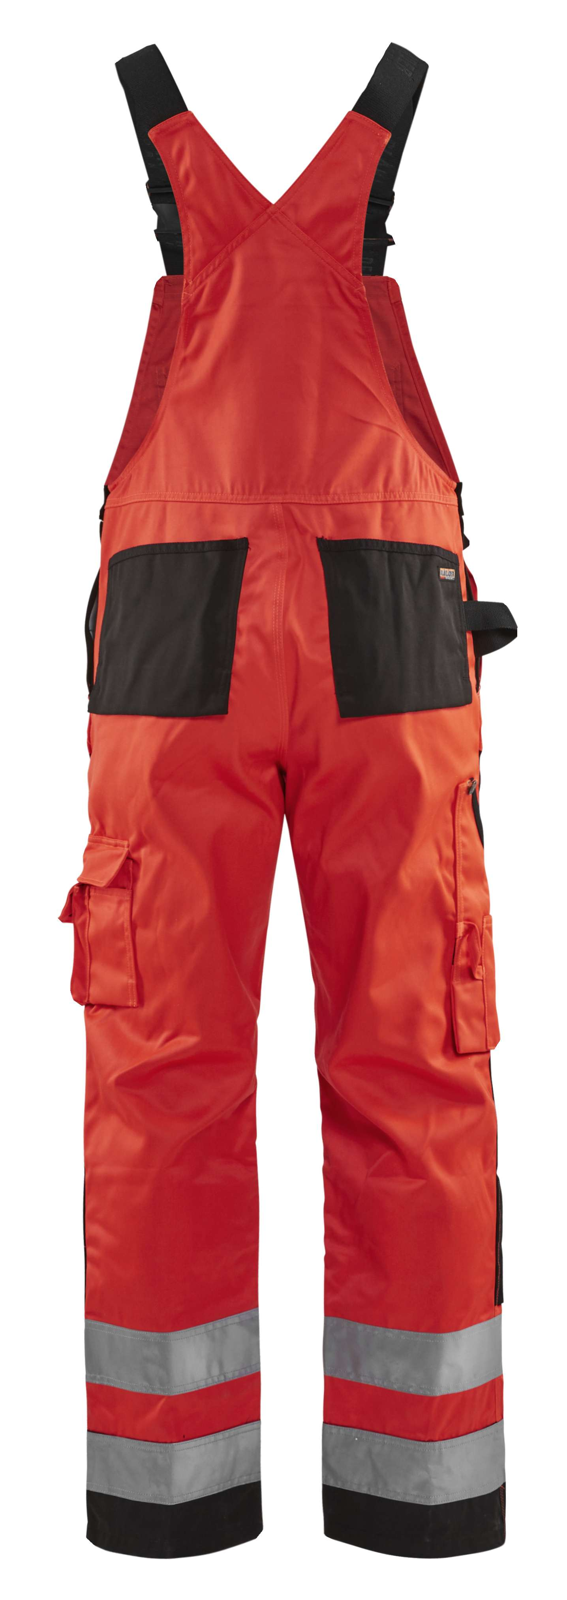 Blaklader Am. Overalls 26601804 High Vis fluo rood-zwart(5599)